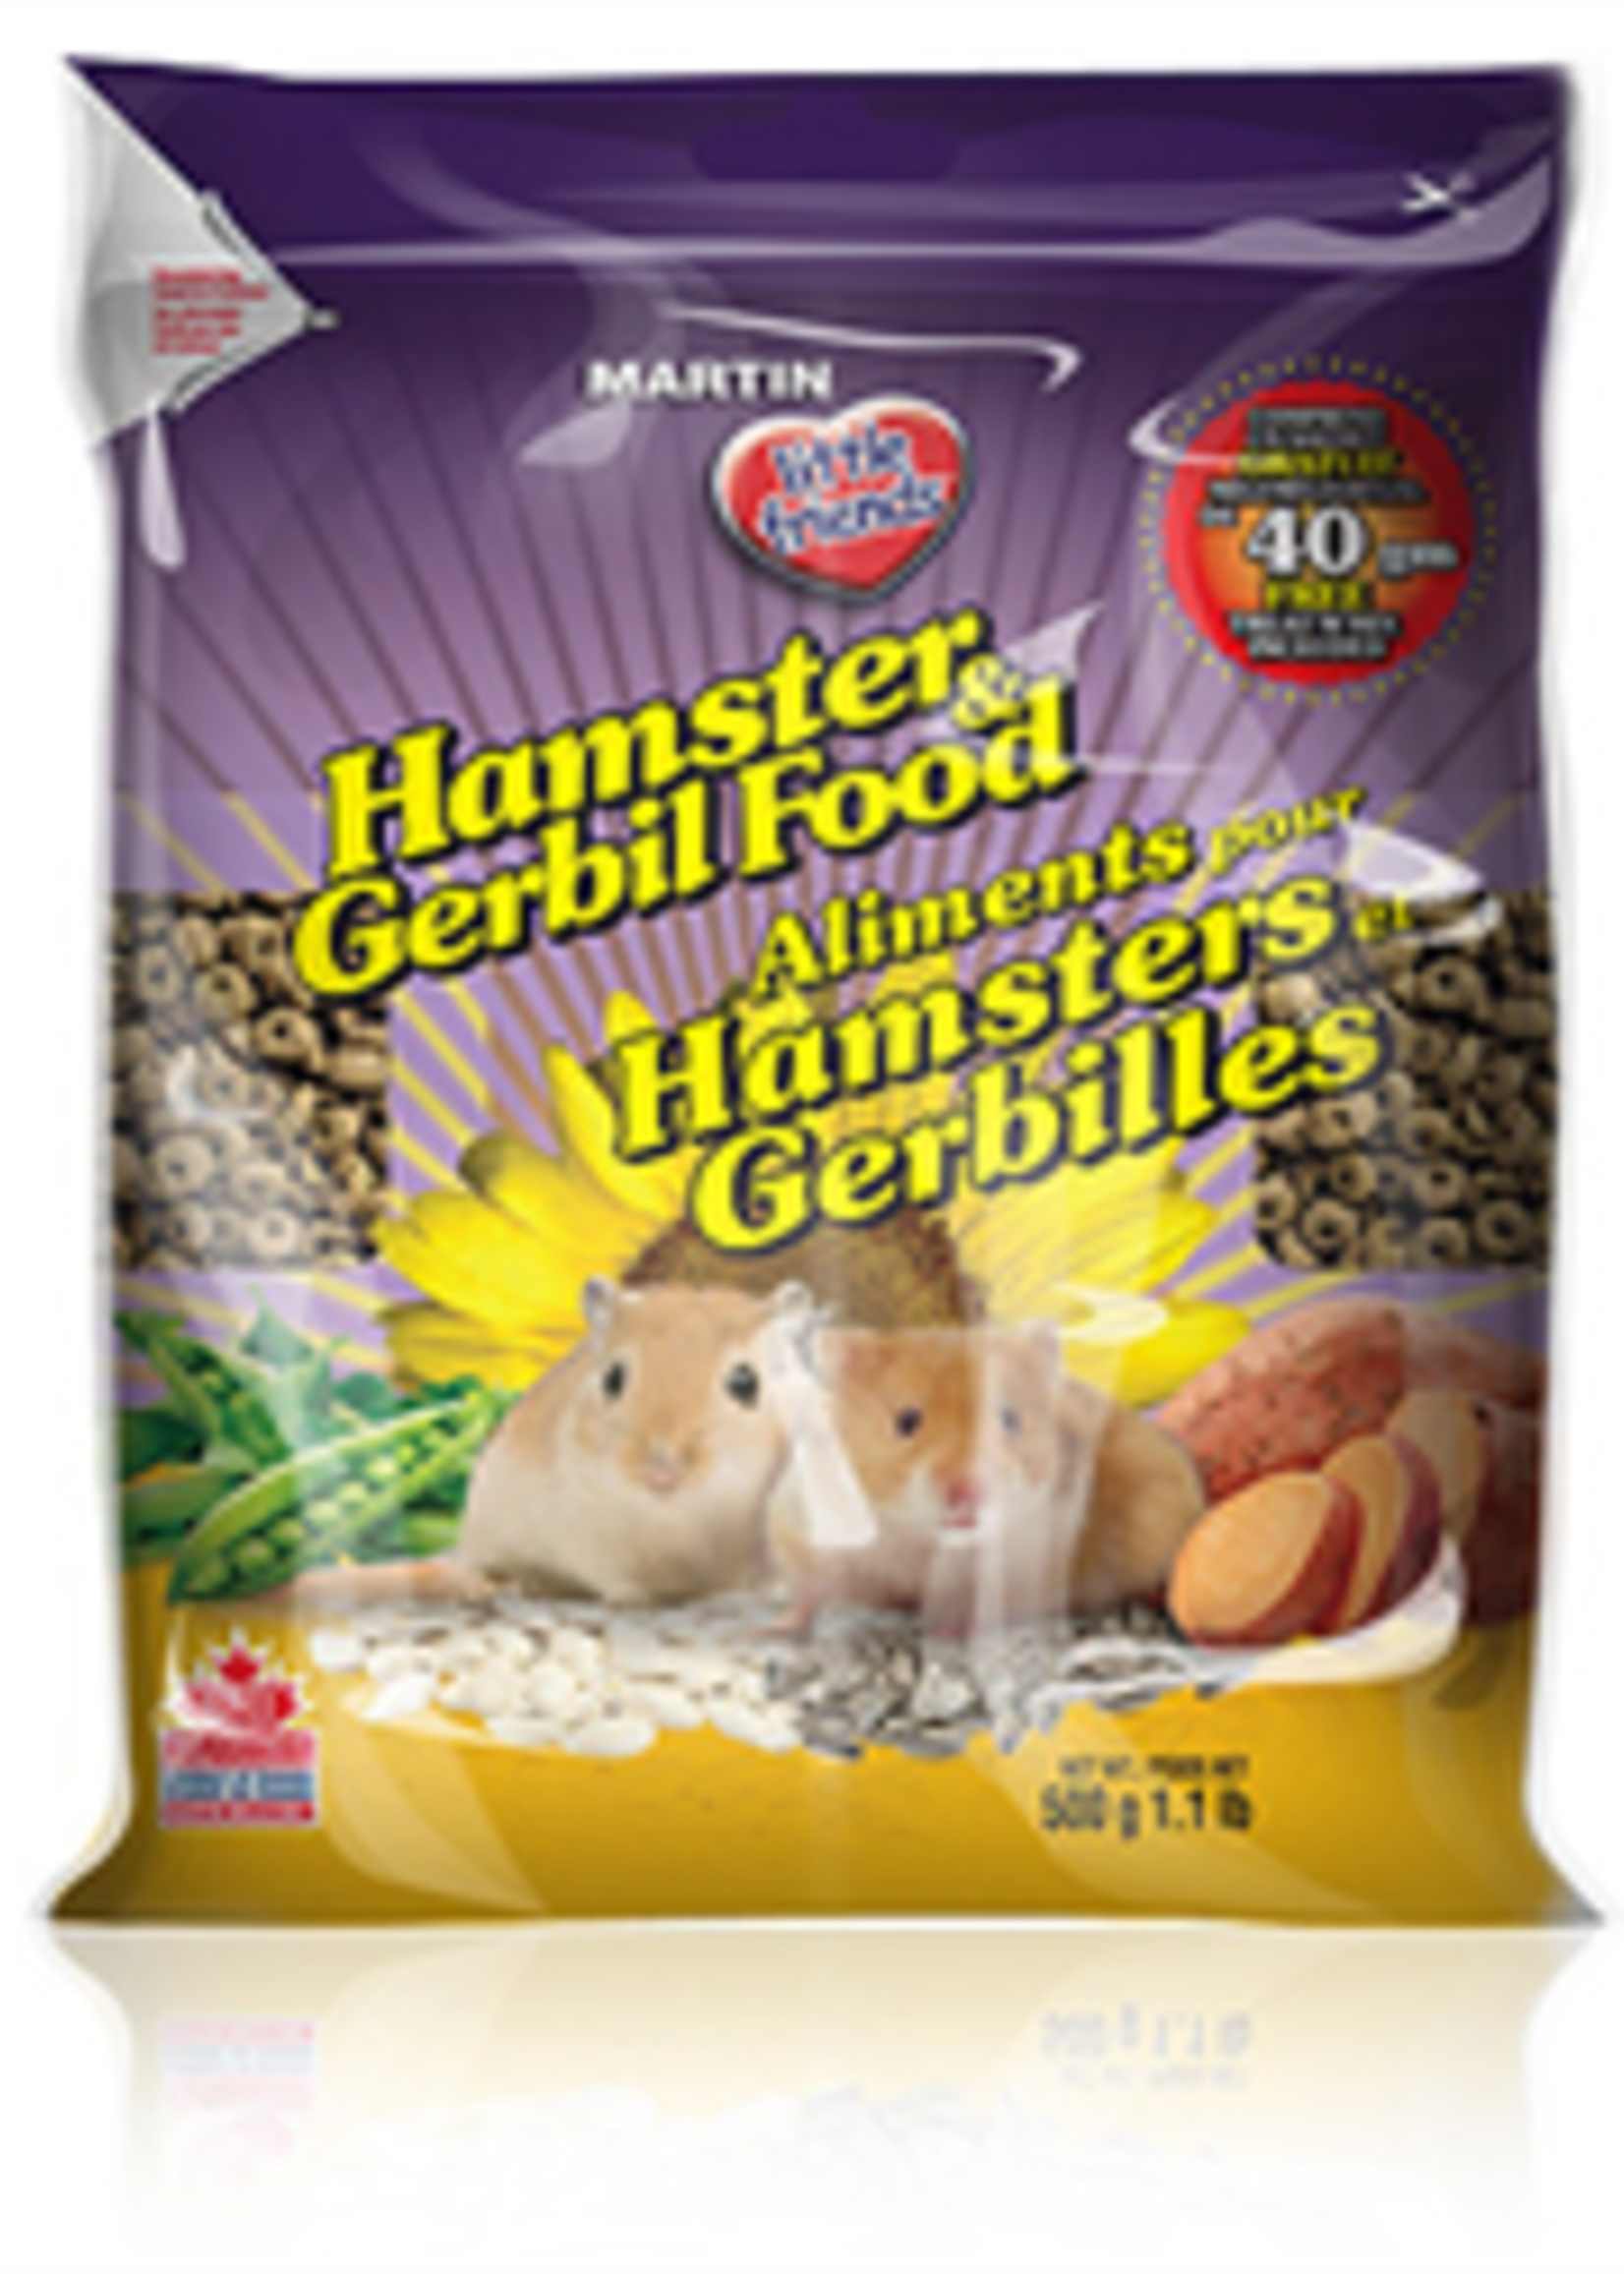 Martin little friends™ Martin little friends™  Hamster & Gerbil Food 500g